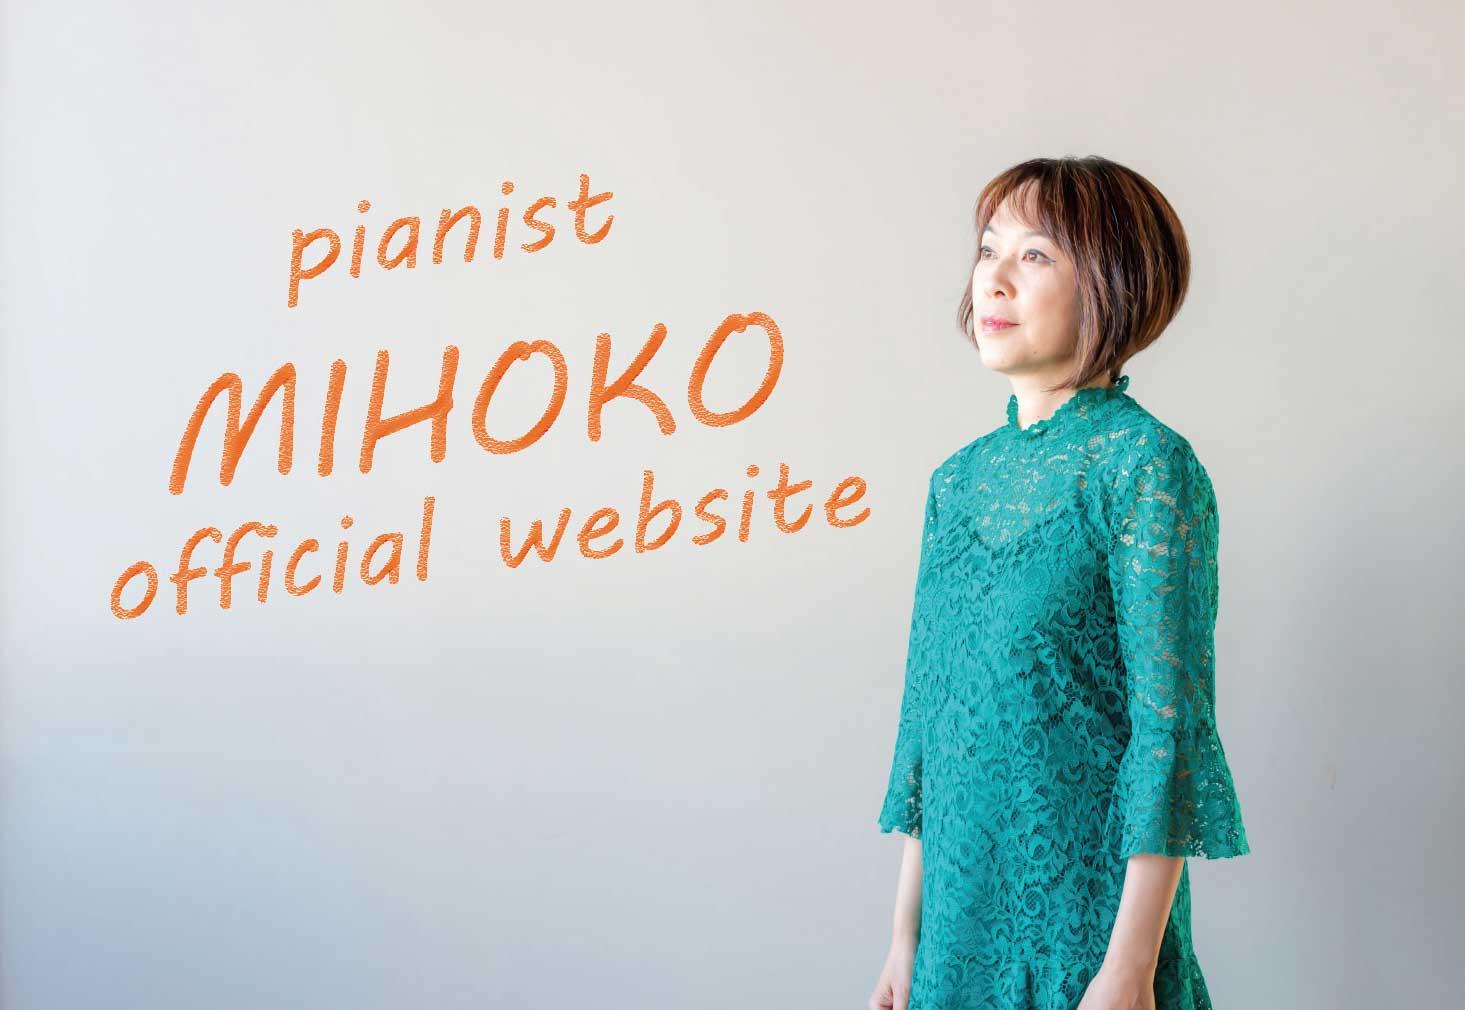 pianist MIHOKO official website